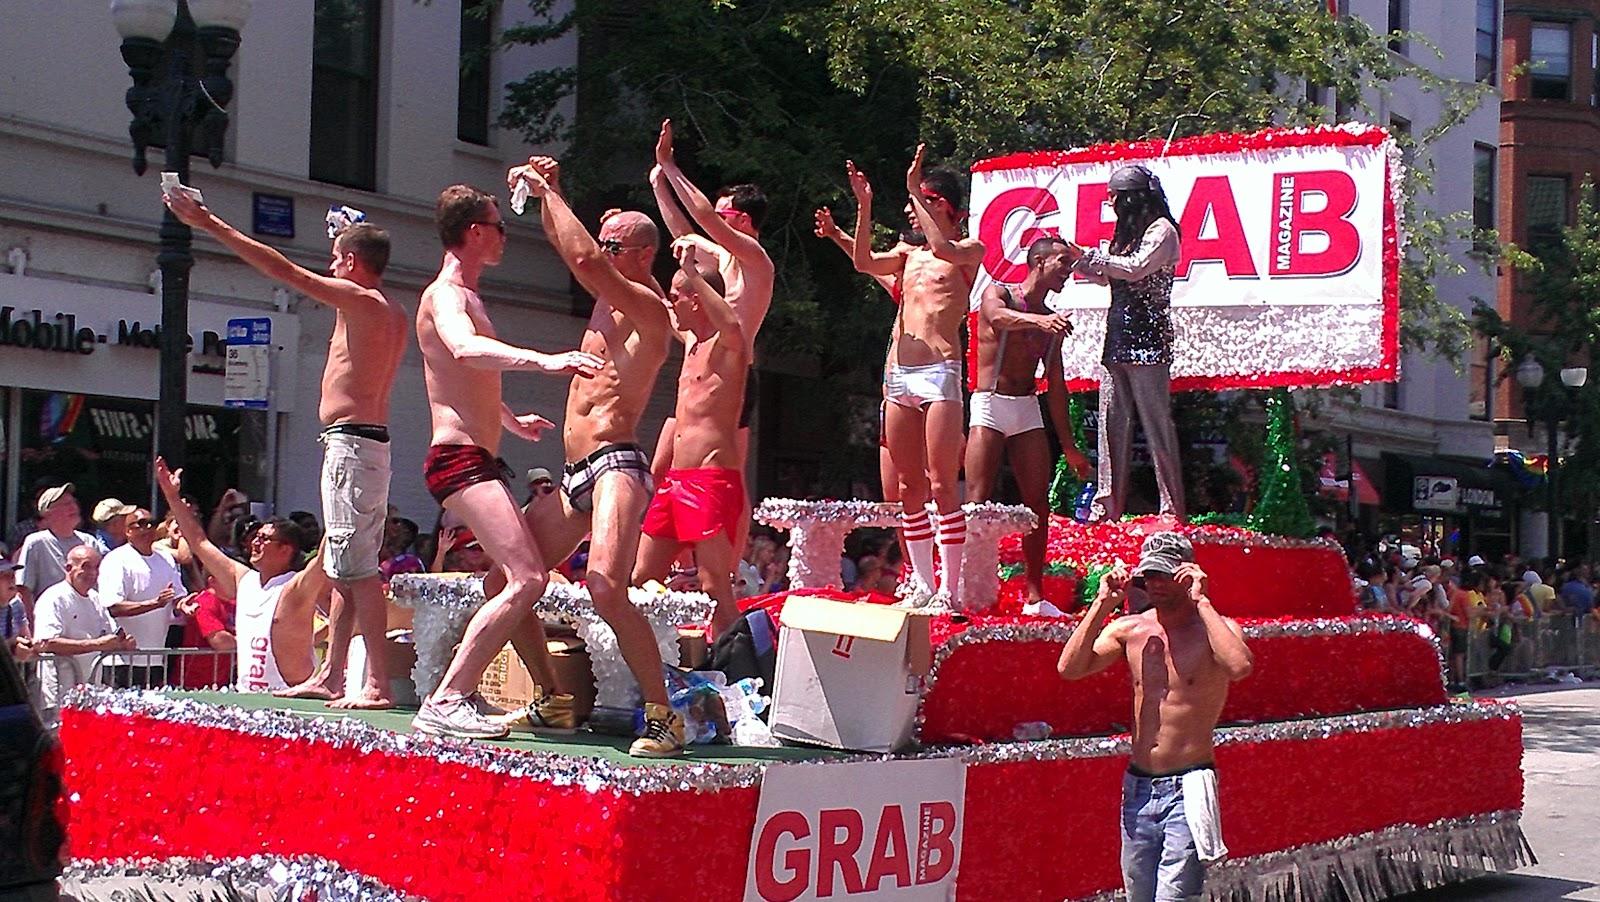 free gay porn video list eat